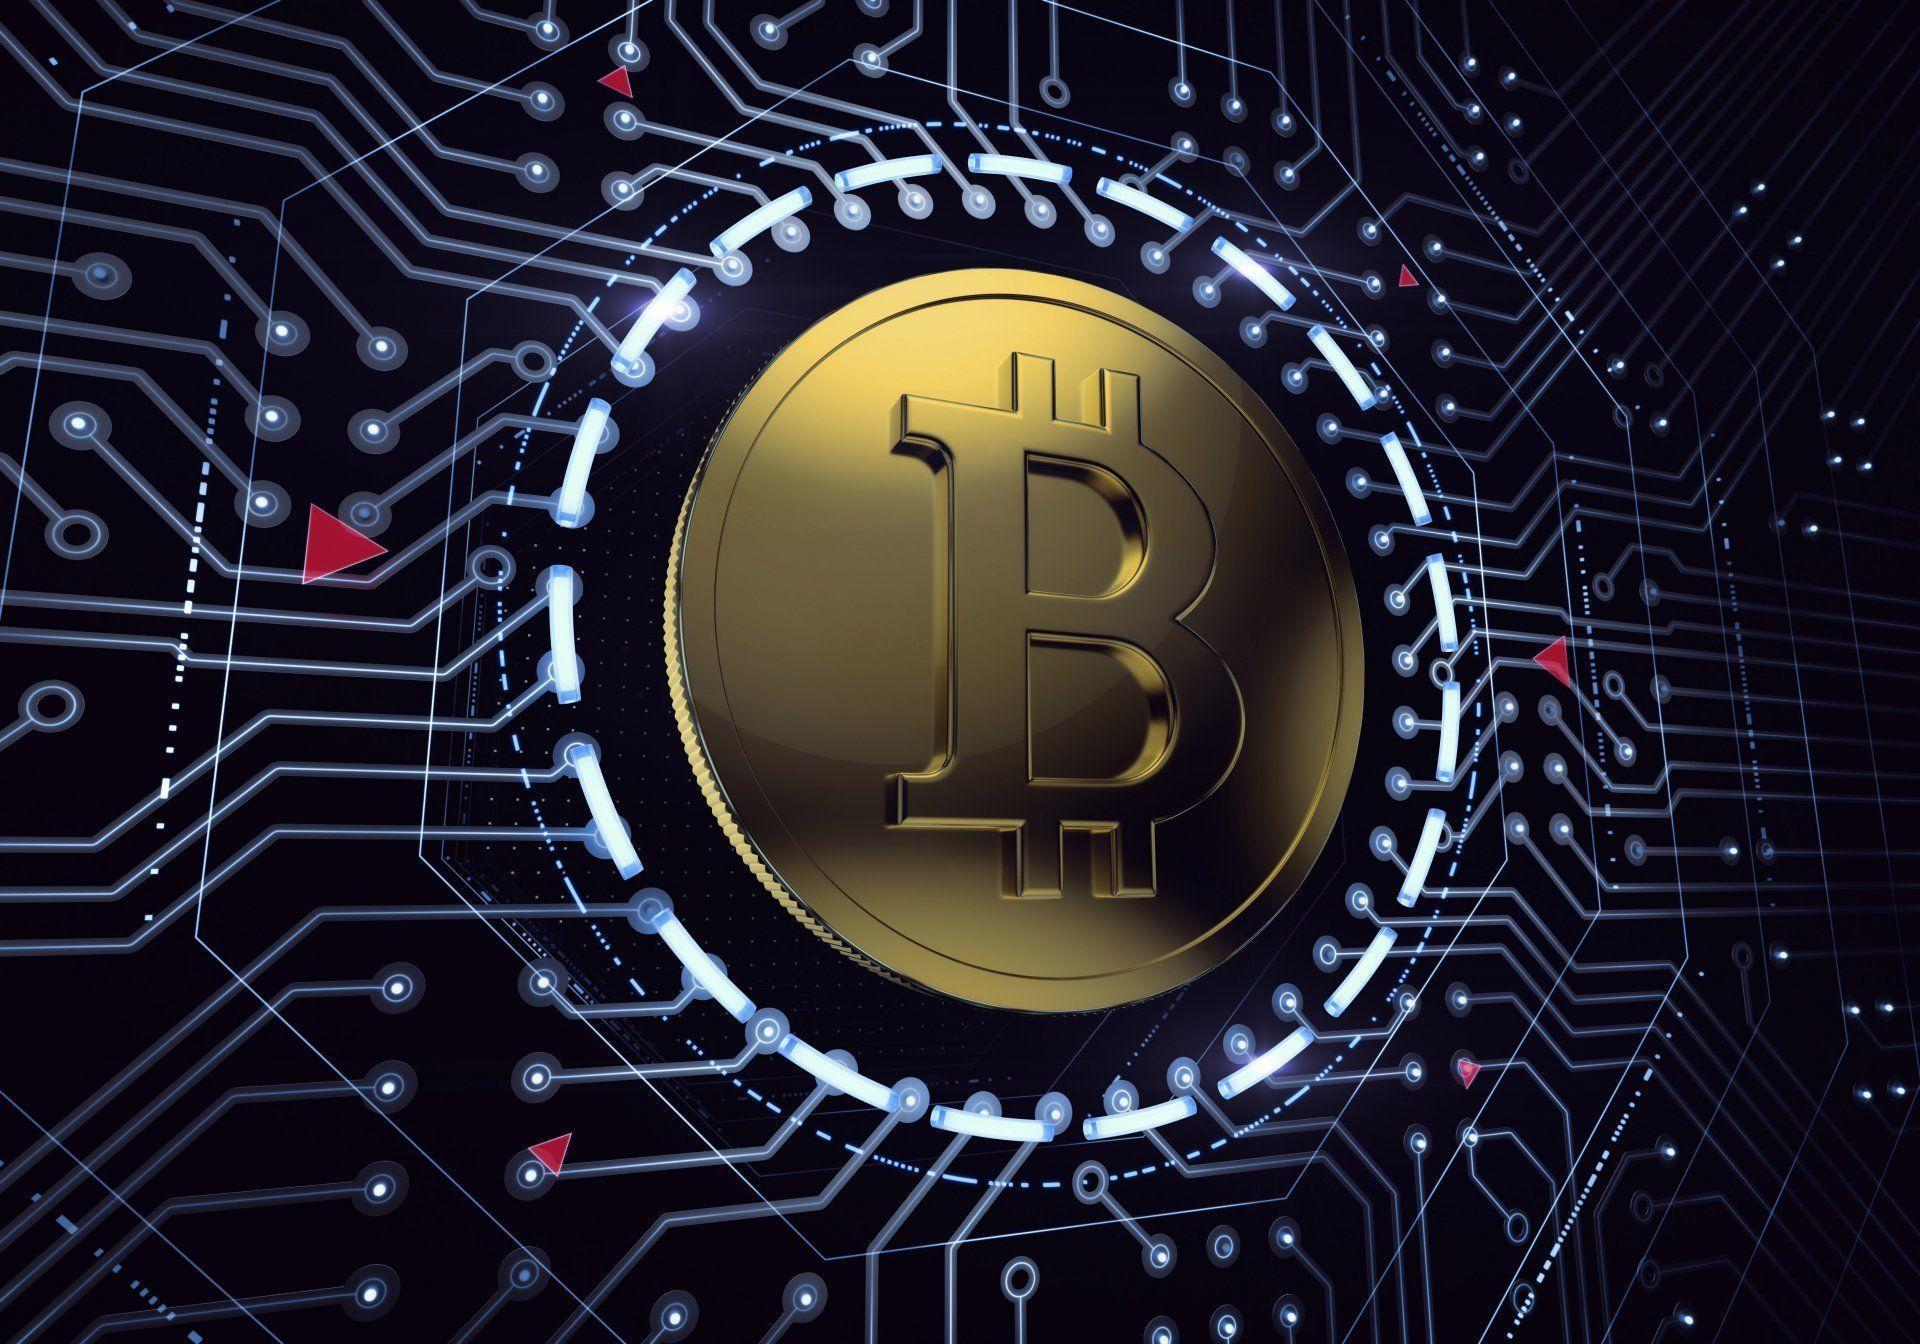 Bitcoins wallpaper designs channel ranger binary options